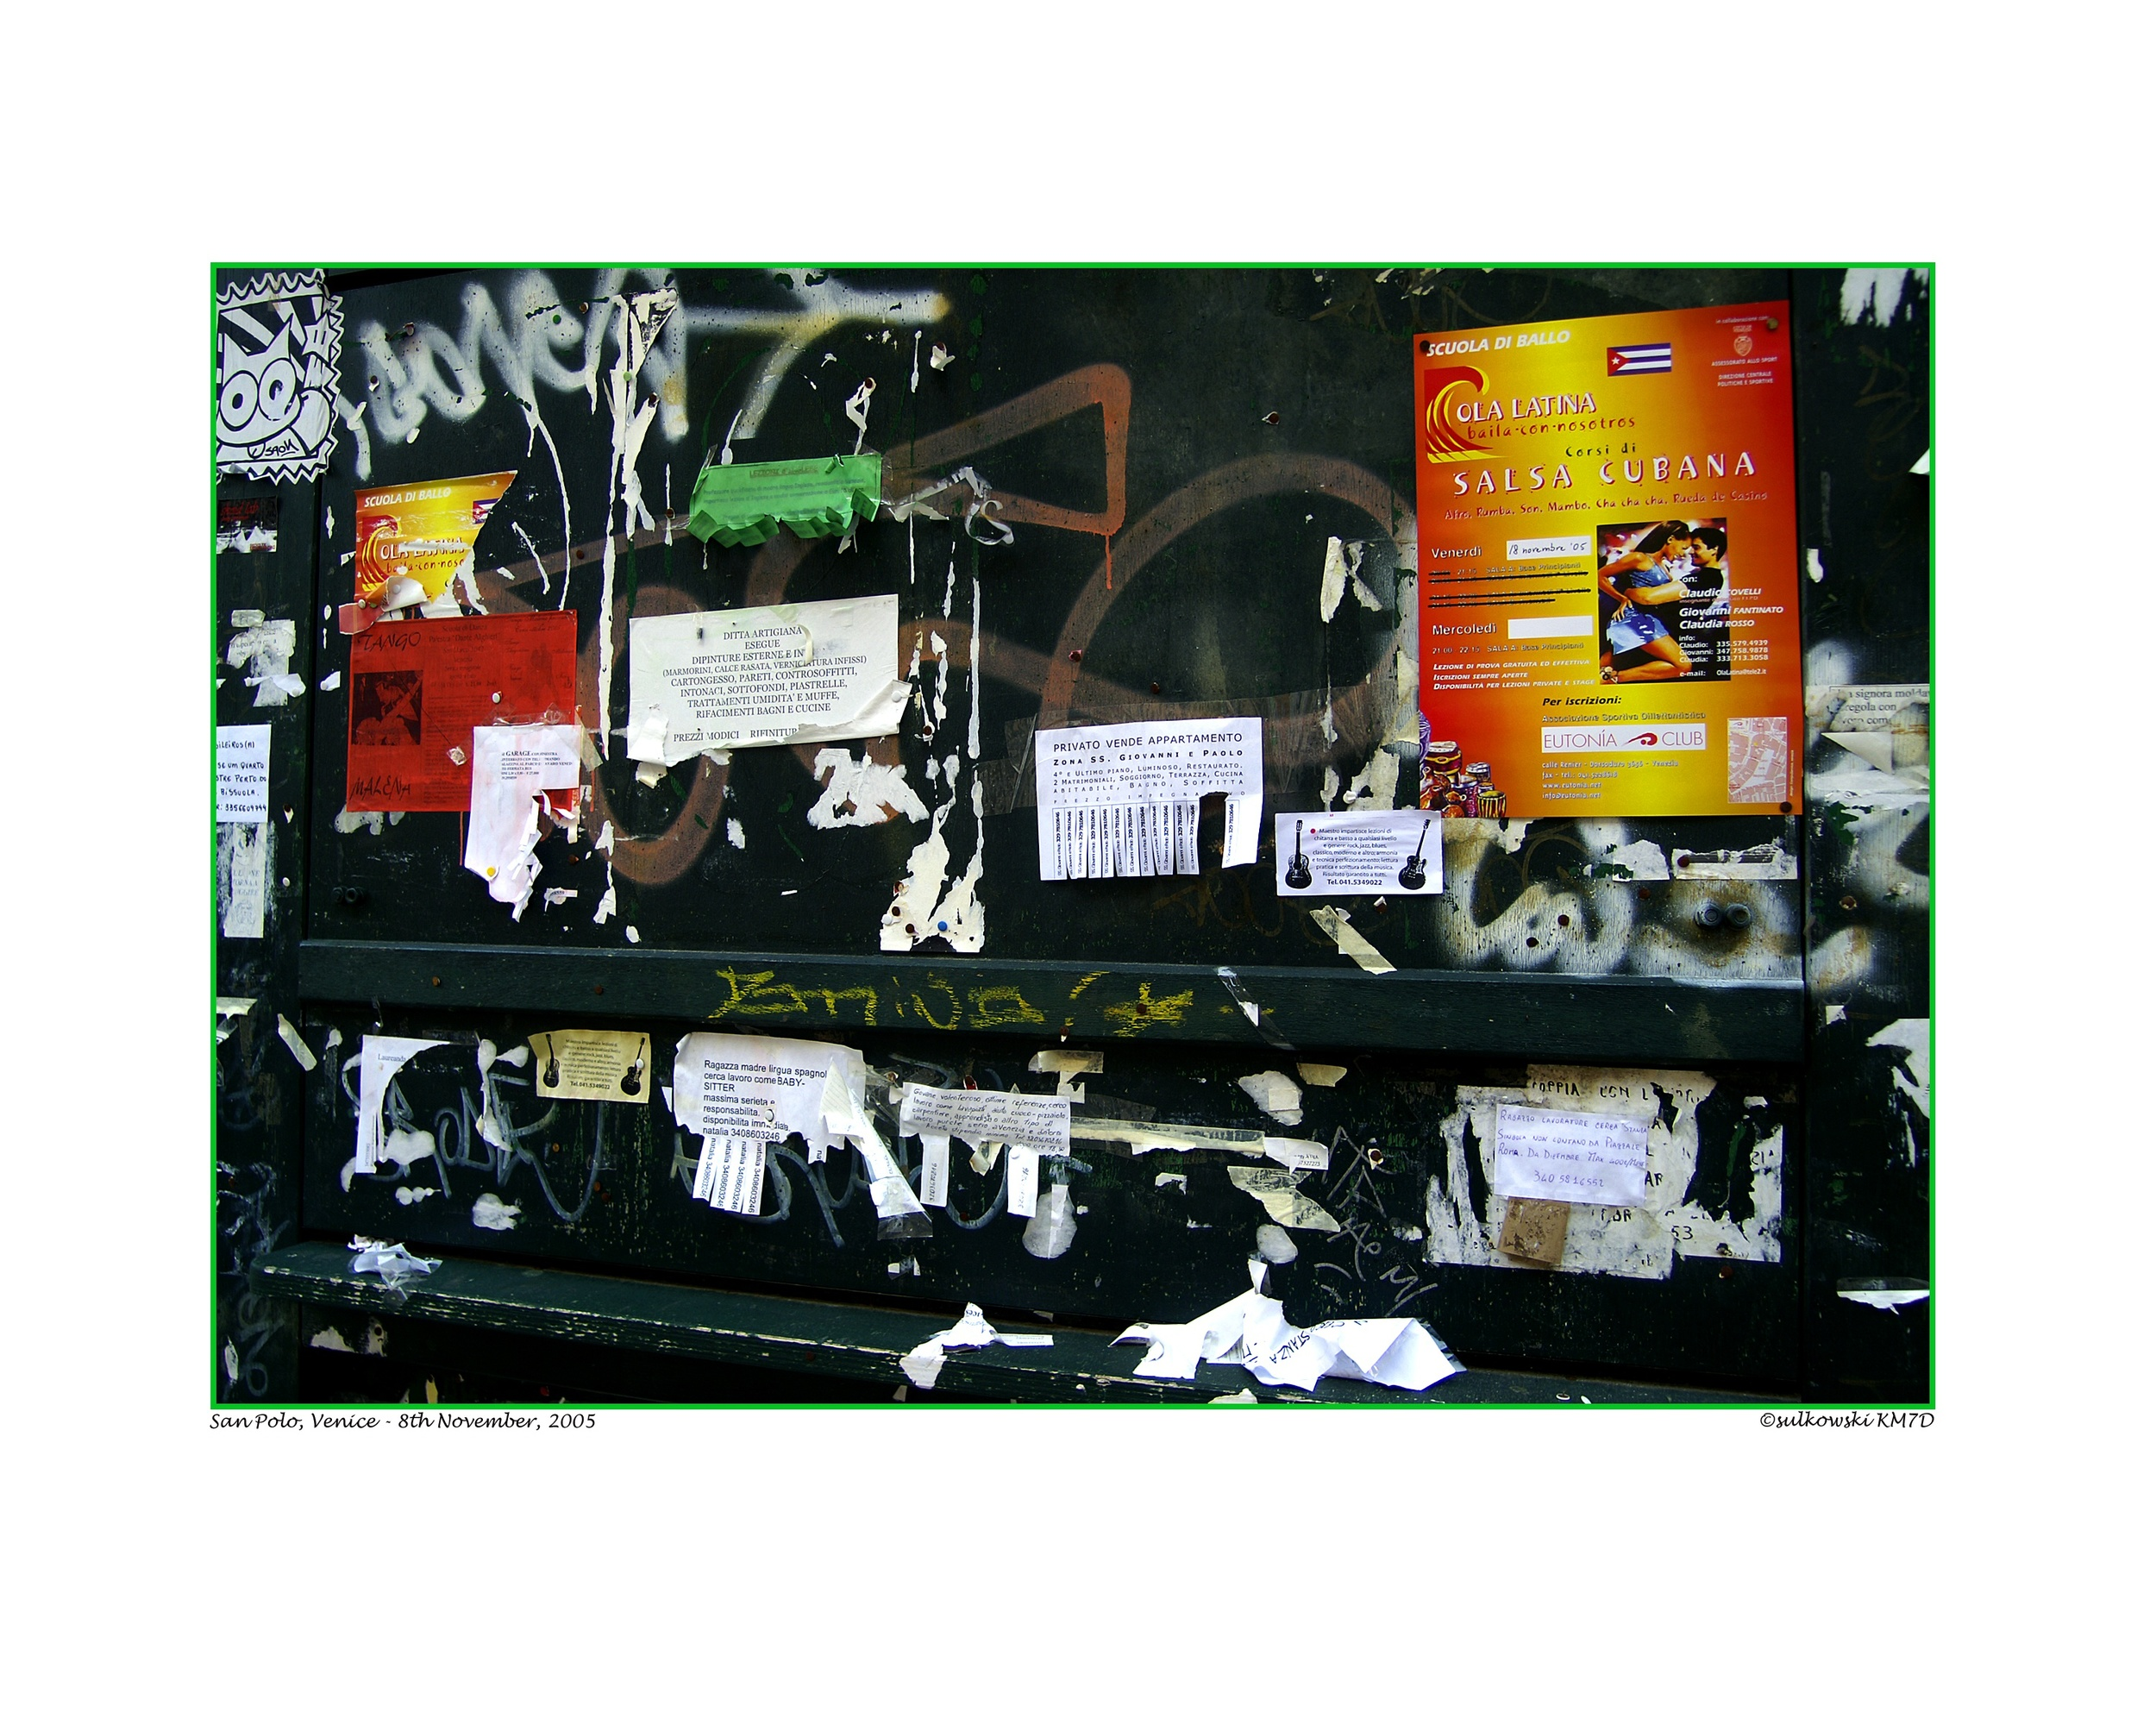 San Polo grafitti_Snapseed.jpg